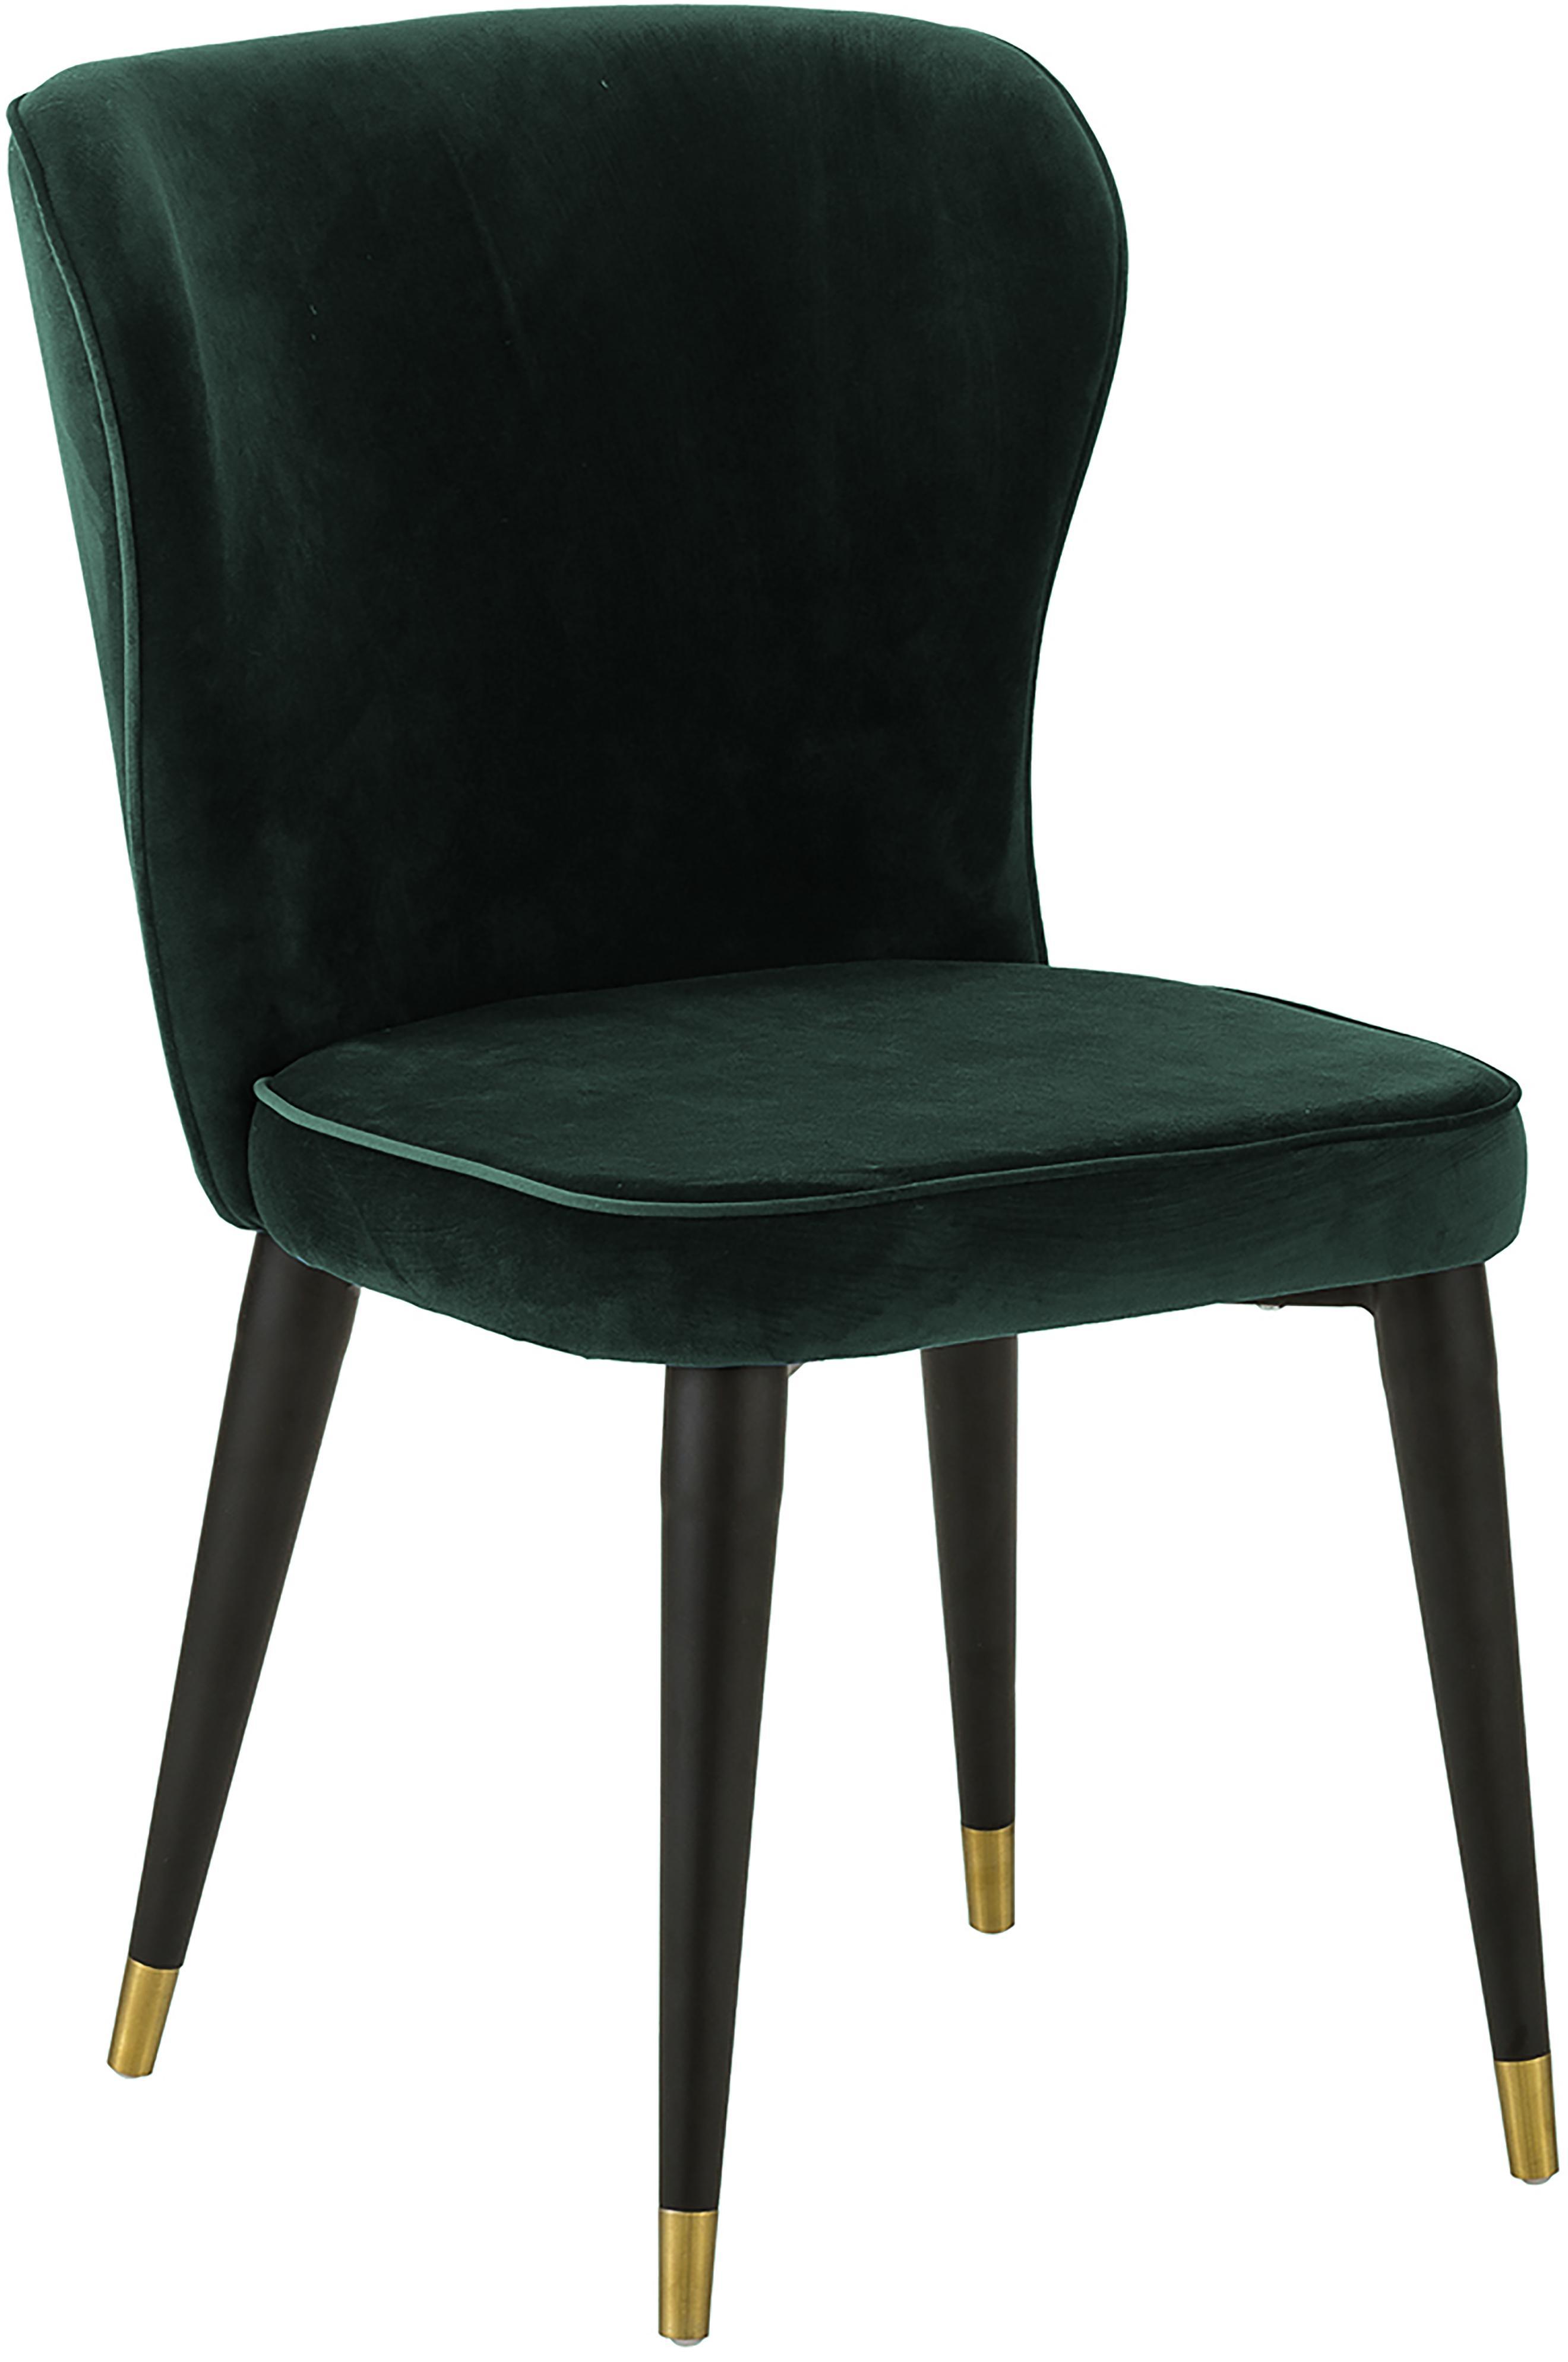 Klassischer Samt-Polsterstuhl Cleo, Bezug: Samt (Polyester) 50.000 S, Beine: Metall, lackiert, Samt Dunkelgrün, B 51 x T 62 cm